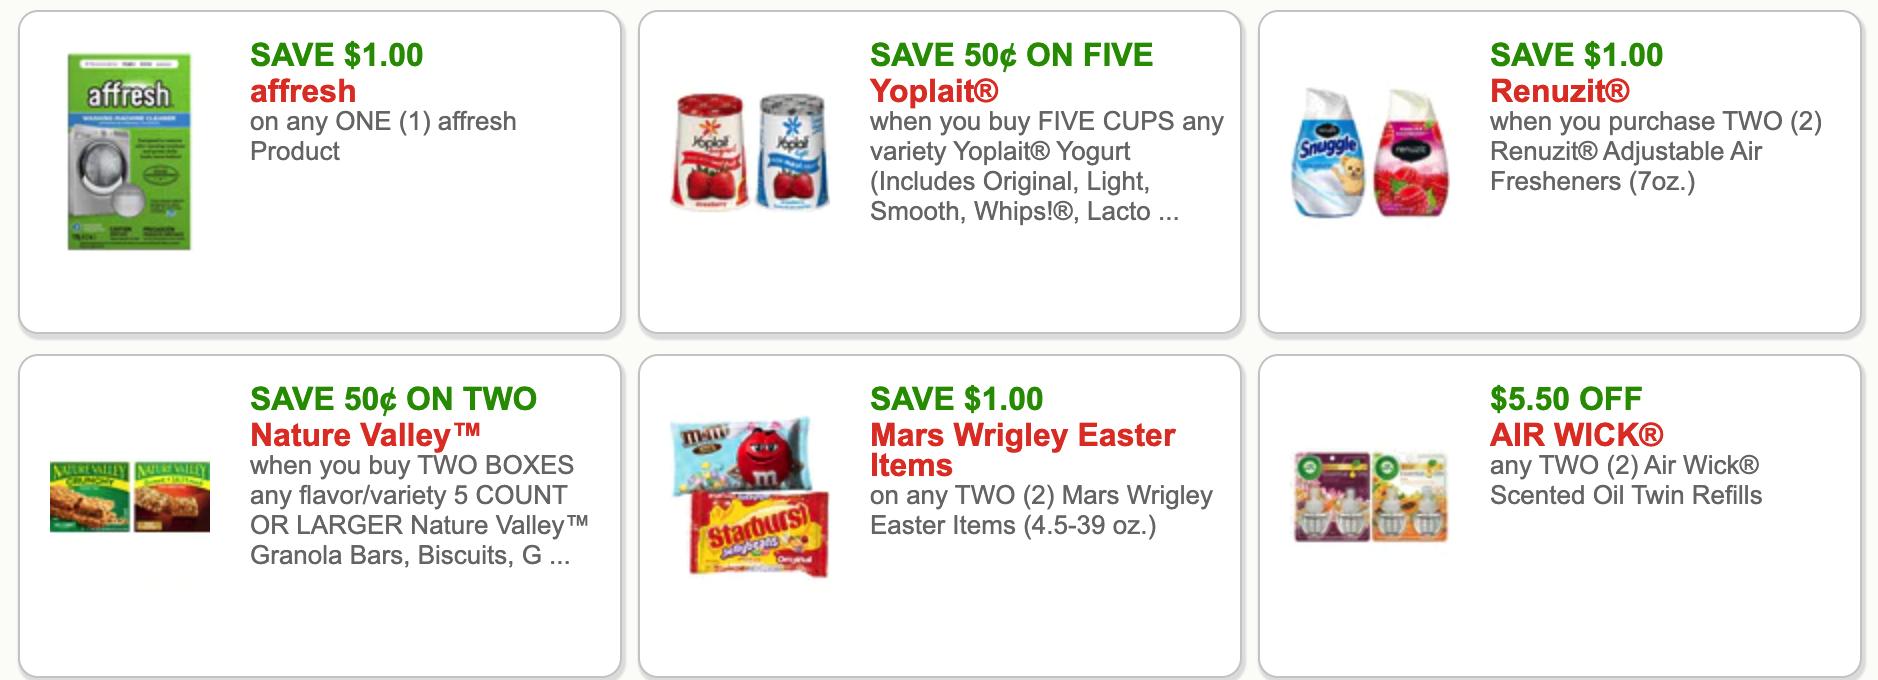 printable coupons kroger krazy